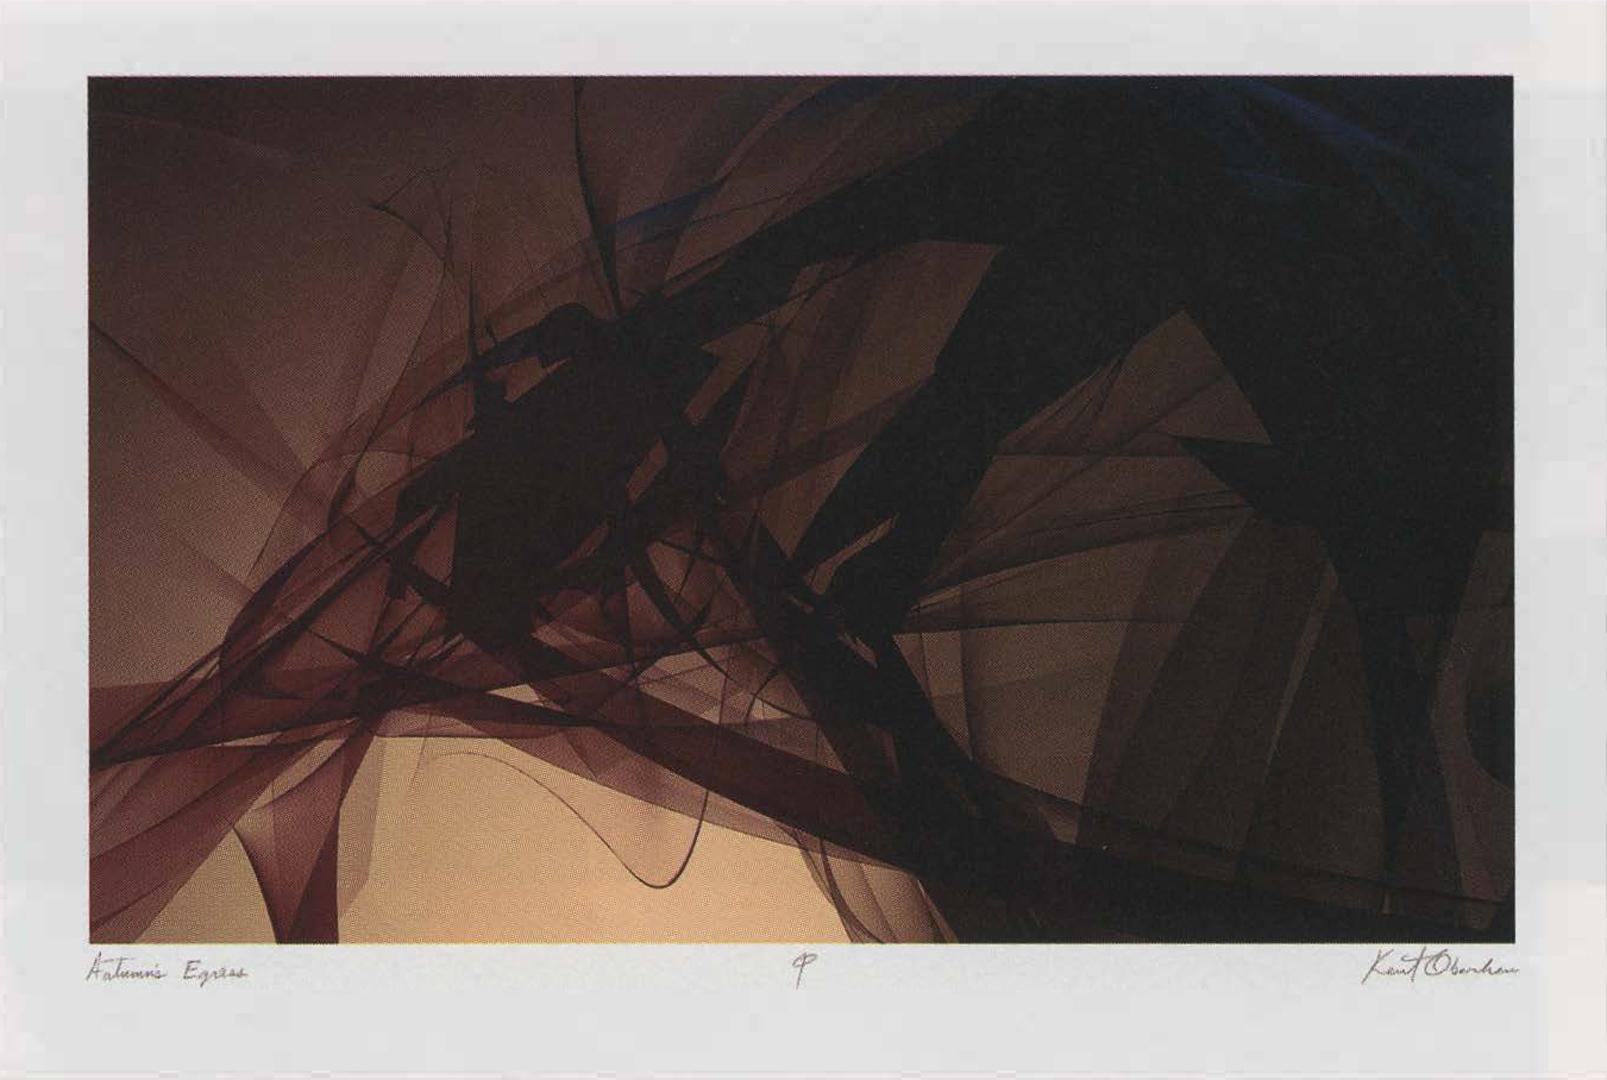 ©2004, Kent Oberheu